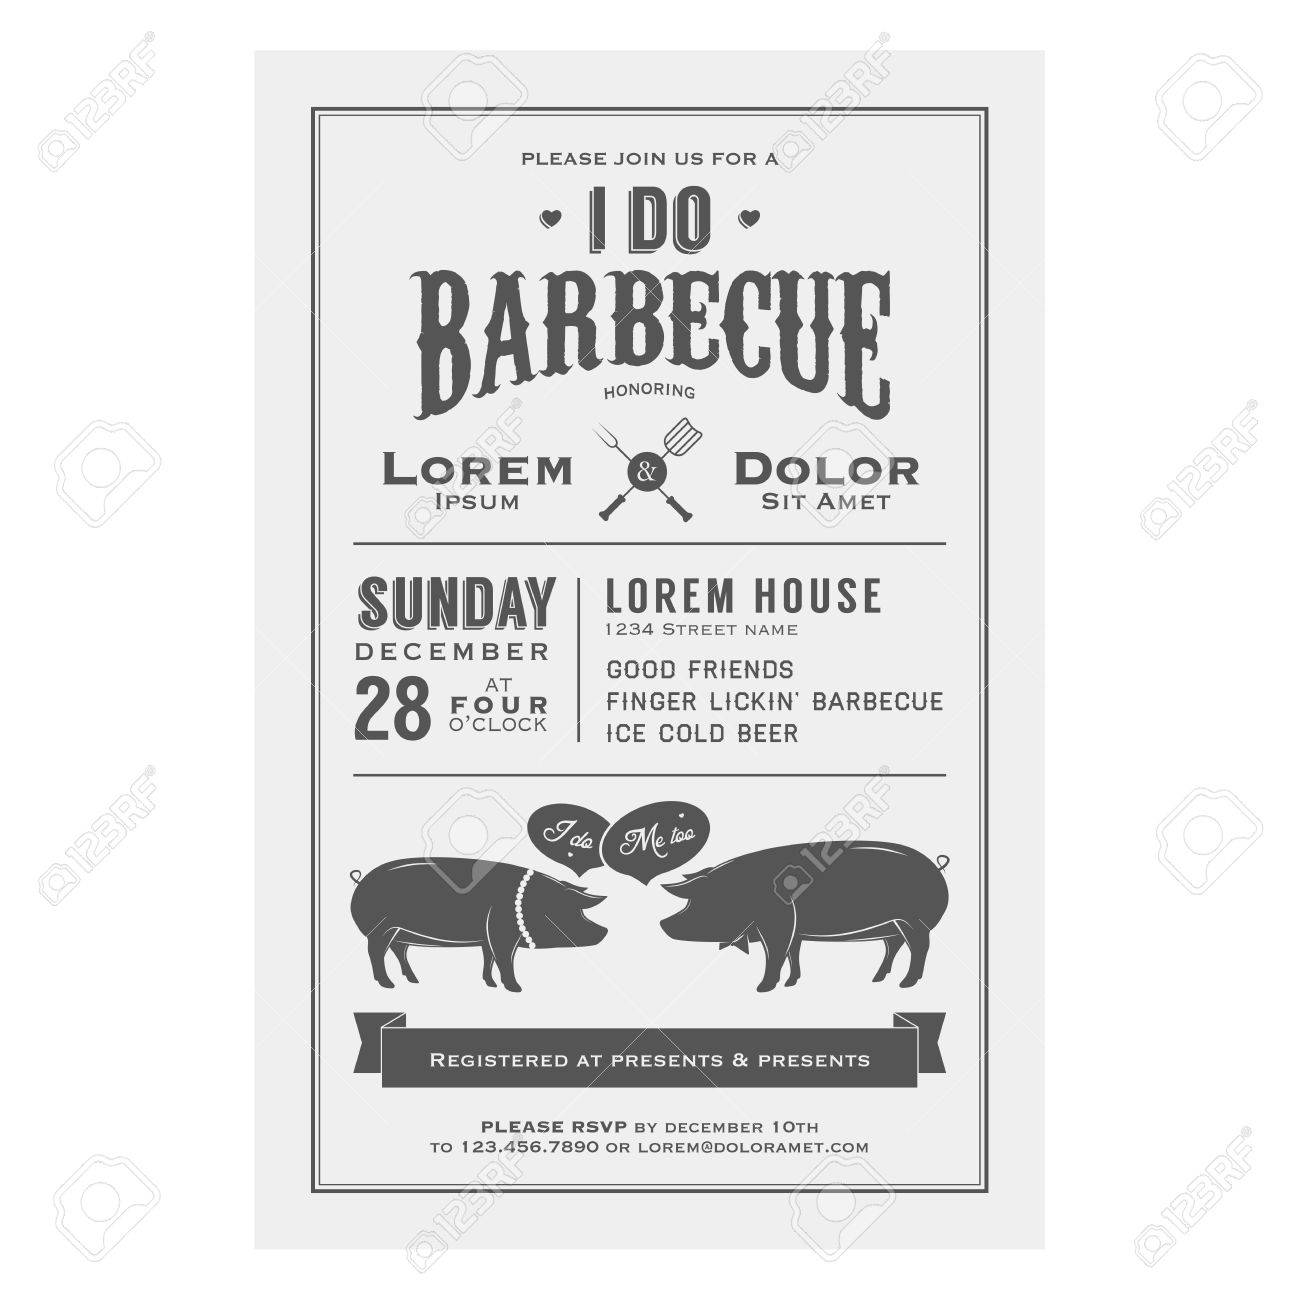 Vintage I Do Barbecue Wedding Invitation Card Royalty Free Cliparts ...